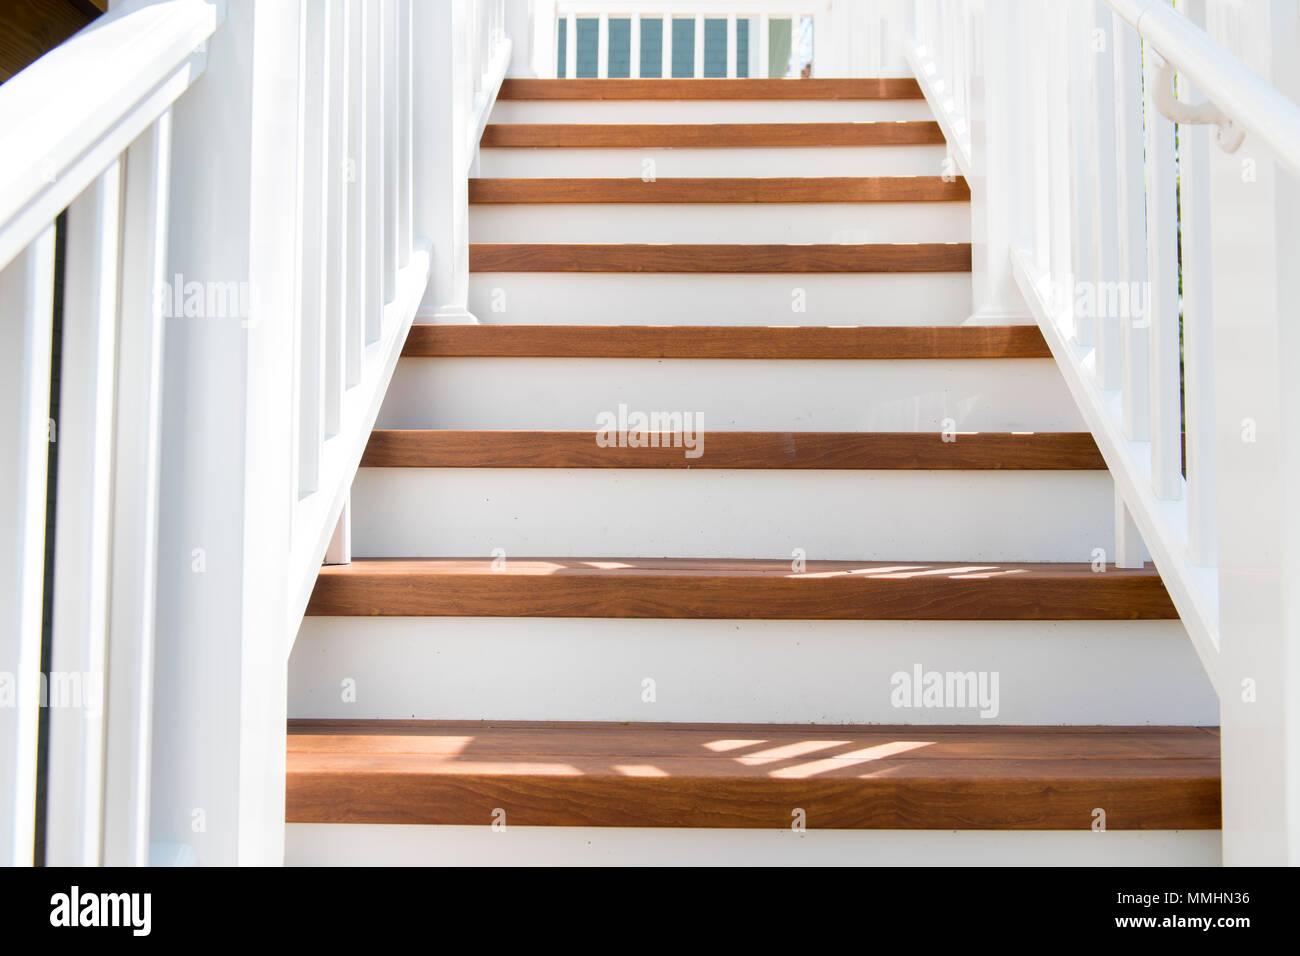 Outdoor Home Treppe mit künstlichem Holz Schritte alternative langlebige Material Stockbild